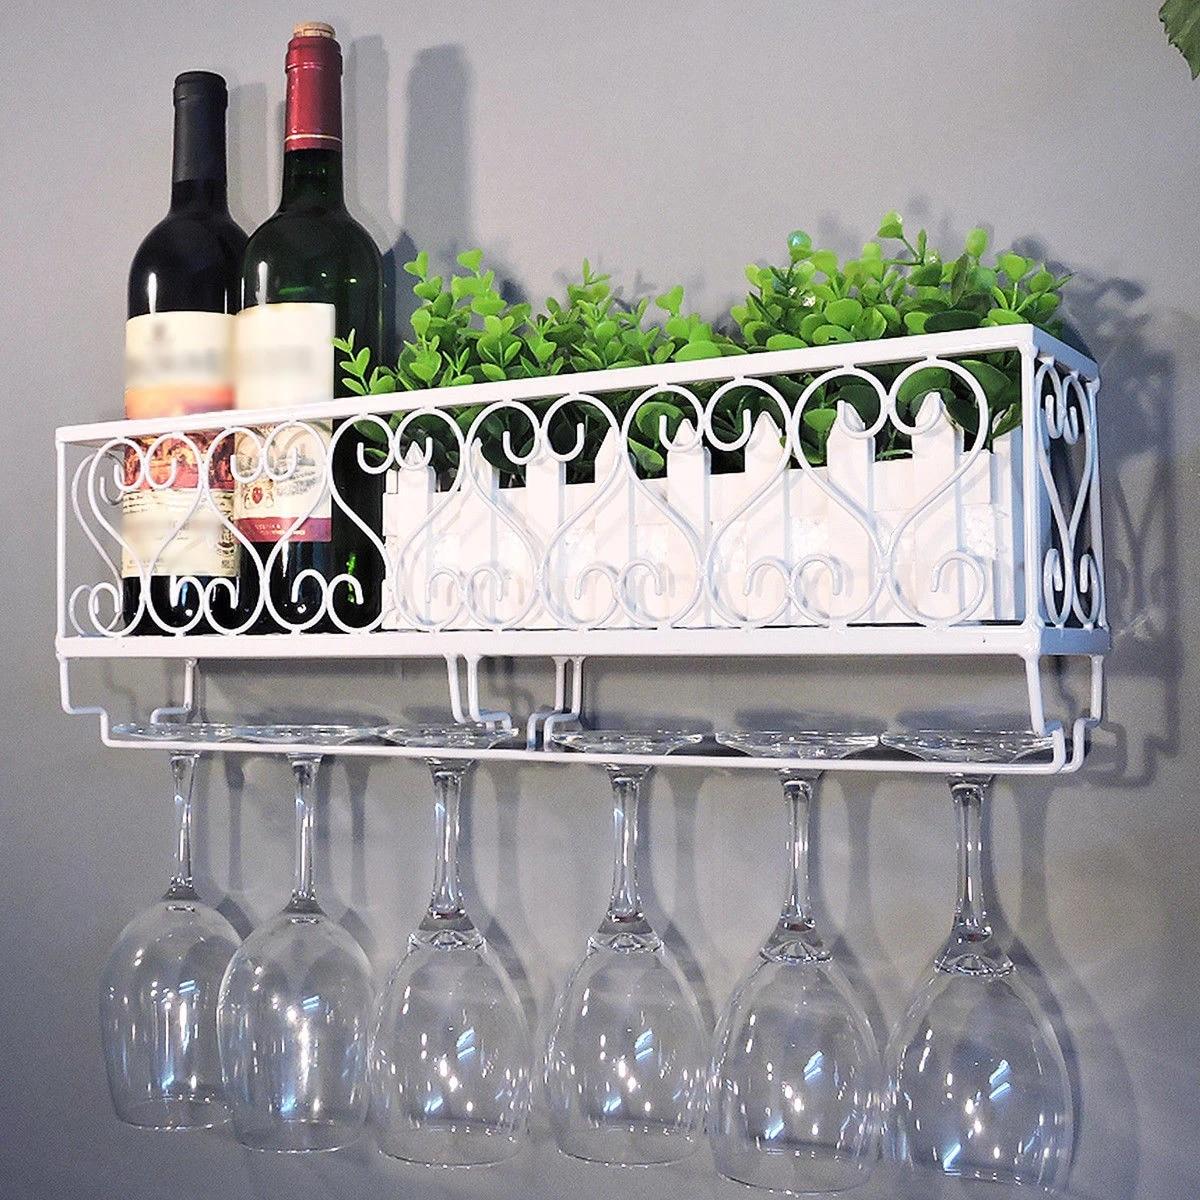 1pc wine rack cup glass holder display bar shelf wall mounted bottle champagne glass hanger holder bar organizer for kitchen